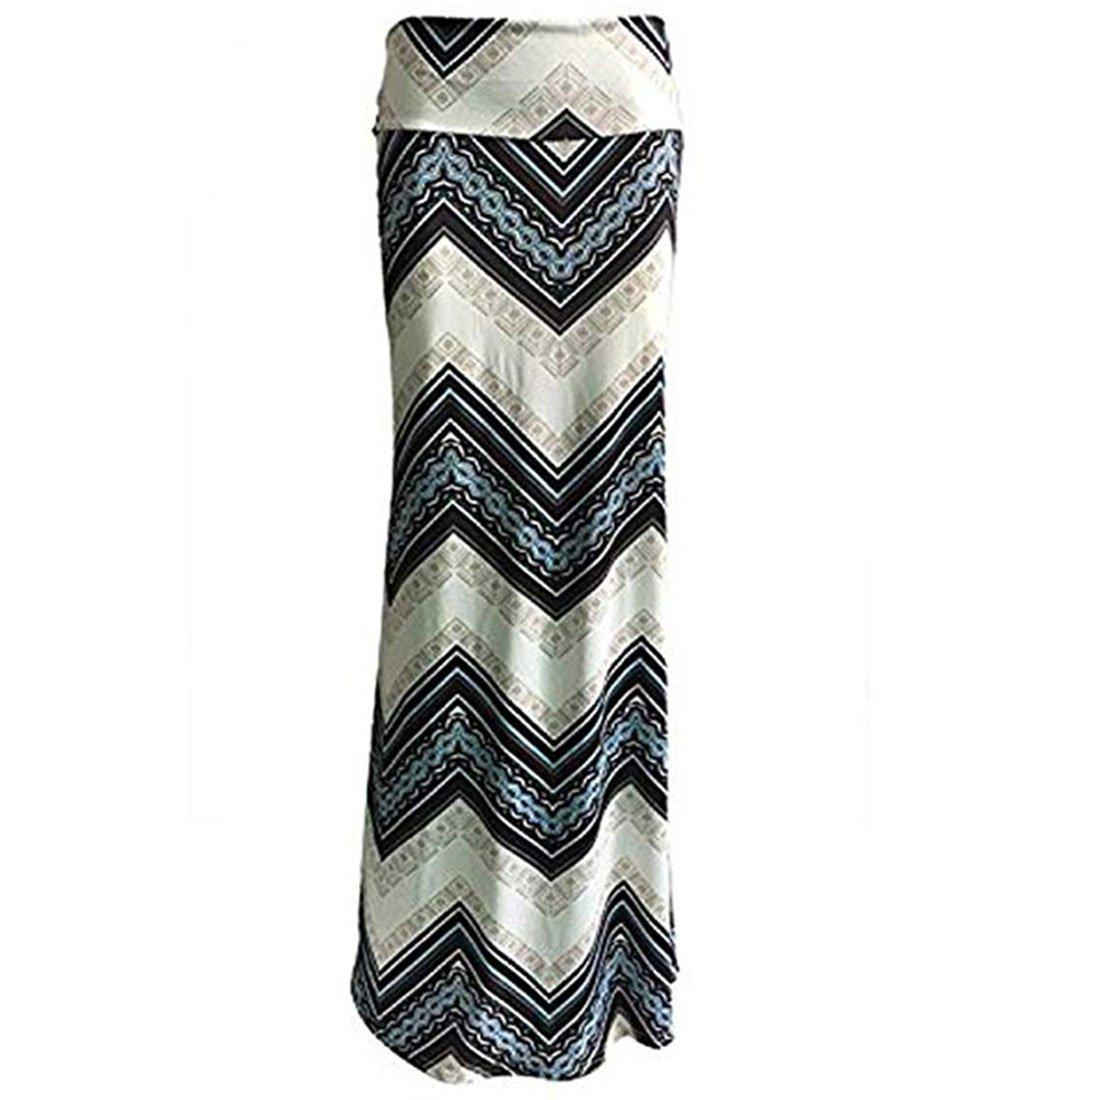 Shilanmei Blue Printed High Waist Maxi Skirt Plus Size Floor-Length Summer Casual Long Skirts for Women (S (US 2))